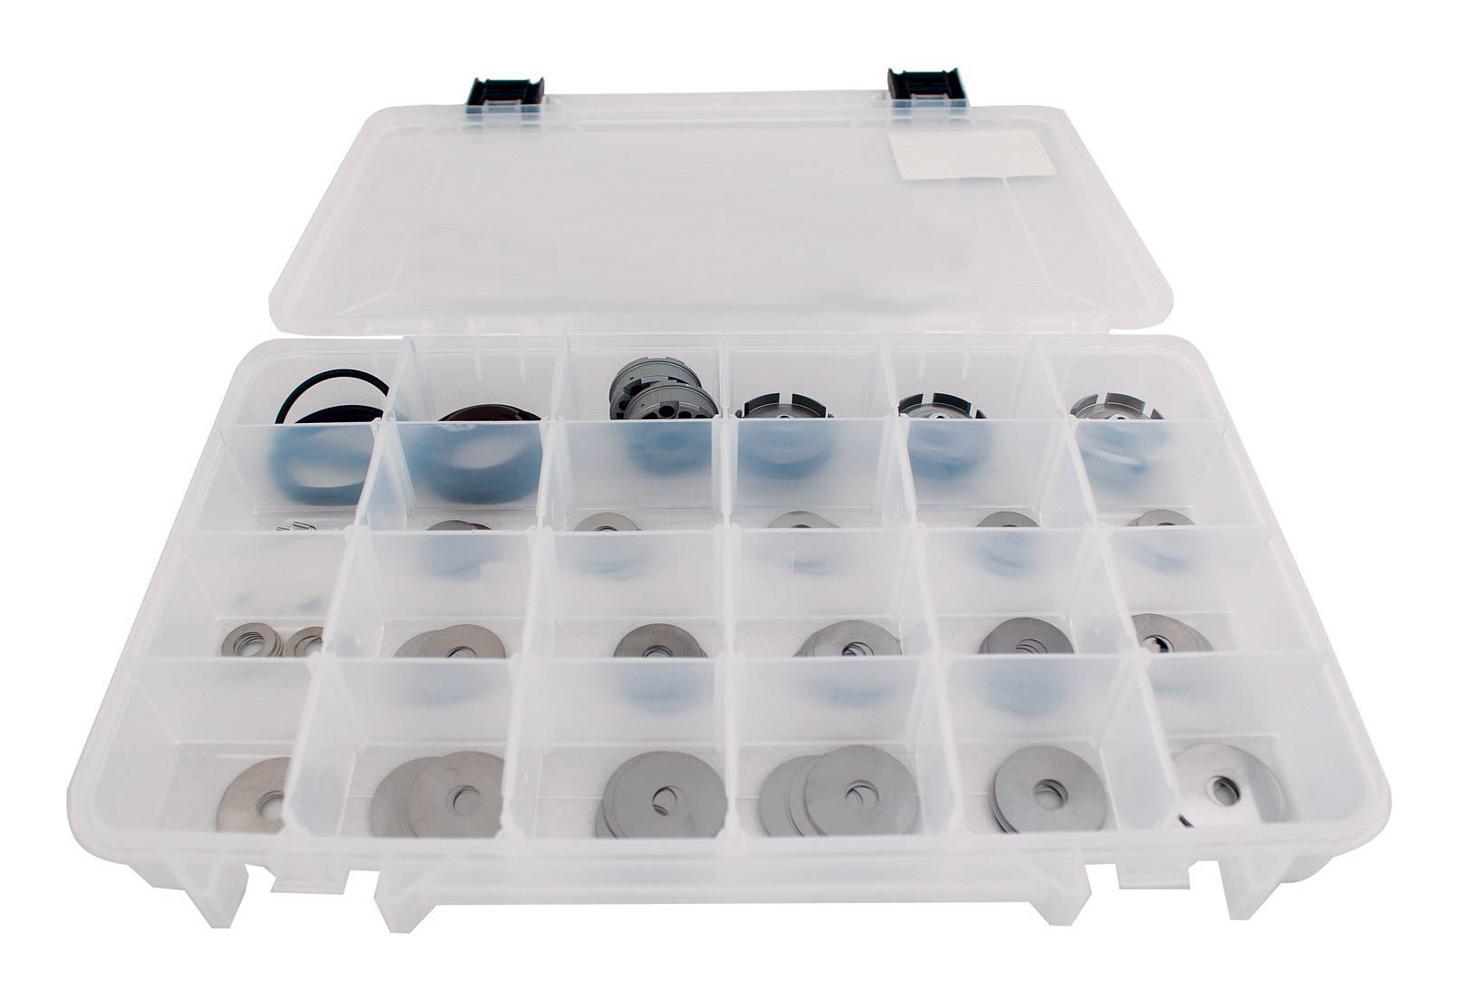 Qa1 Shock Tuning Kit - For Large Body